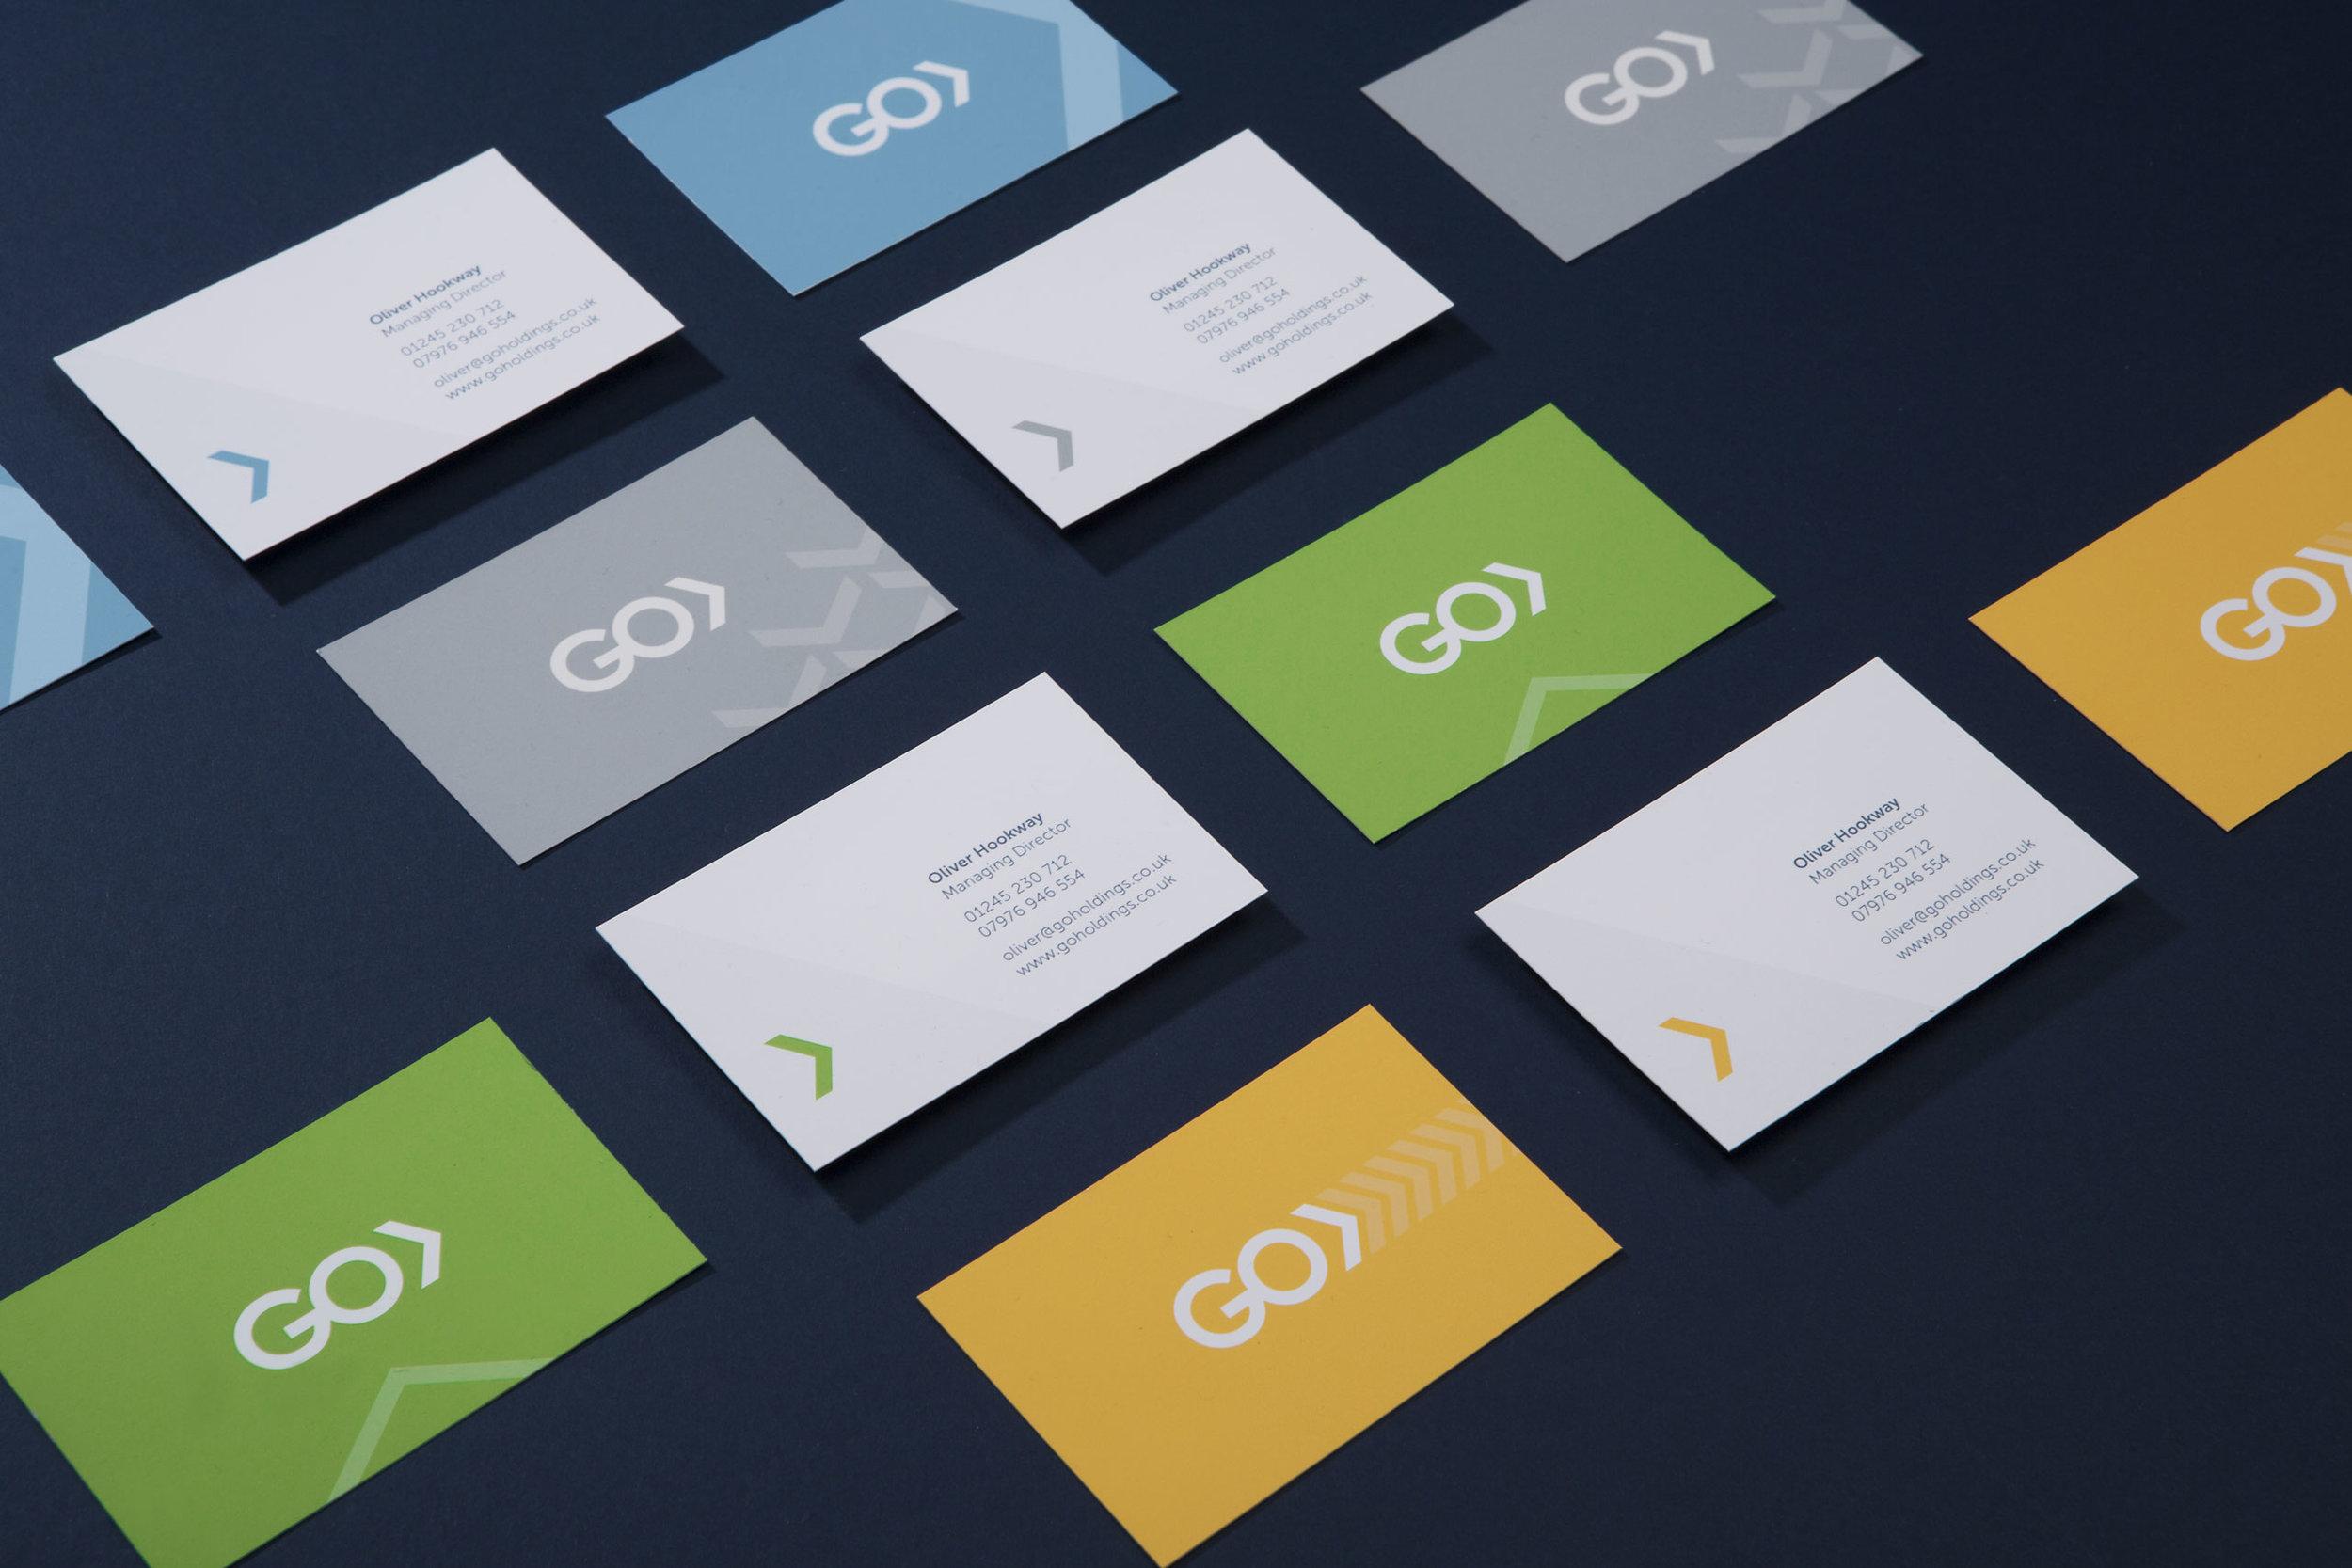 WRB-Design_Go_016.jpg